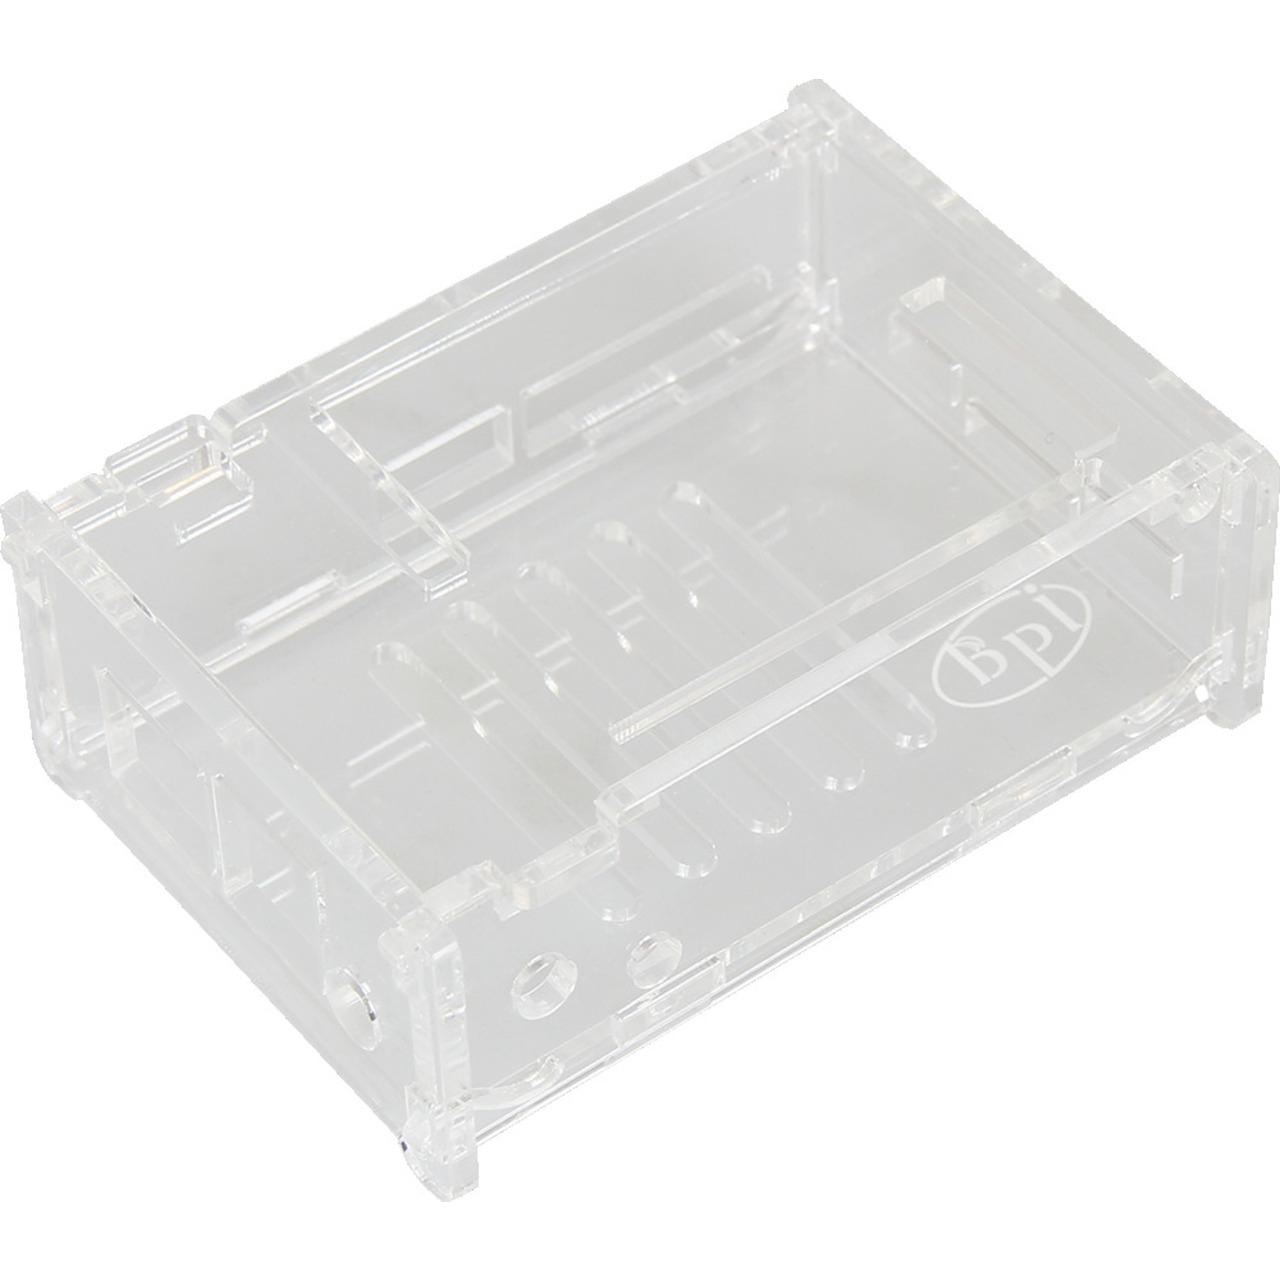 Image of Acryl-Gehäuse für Banana Pi M3, transparent